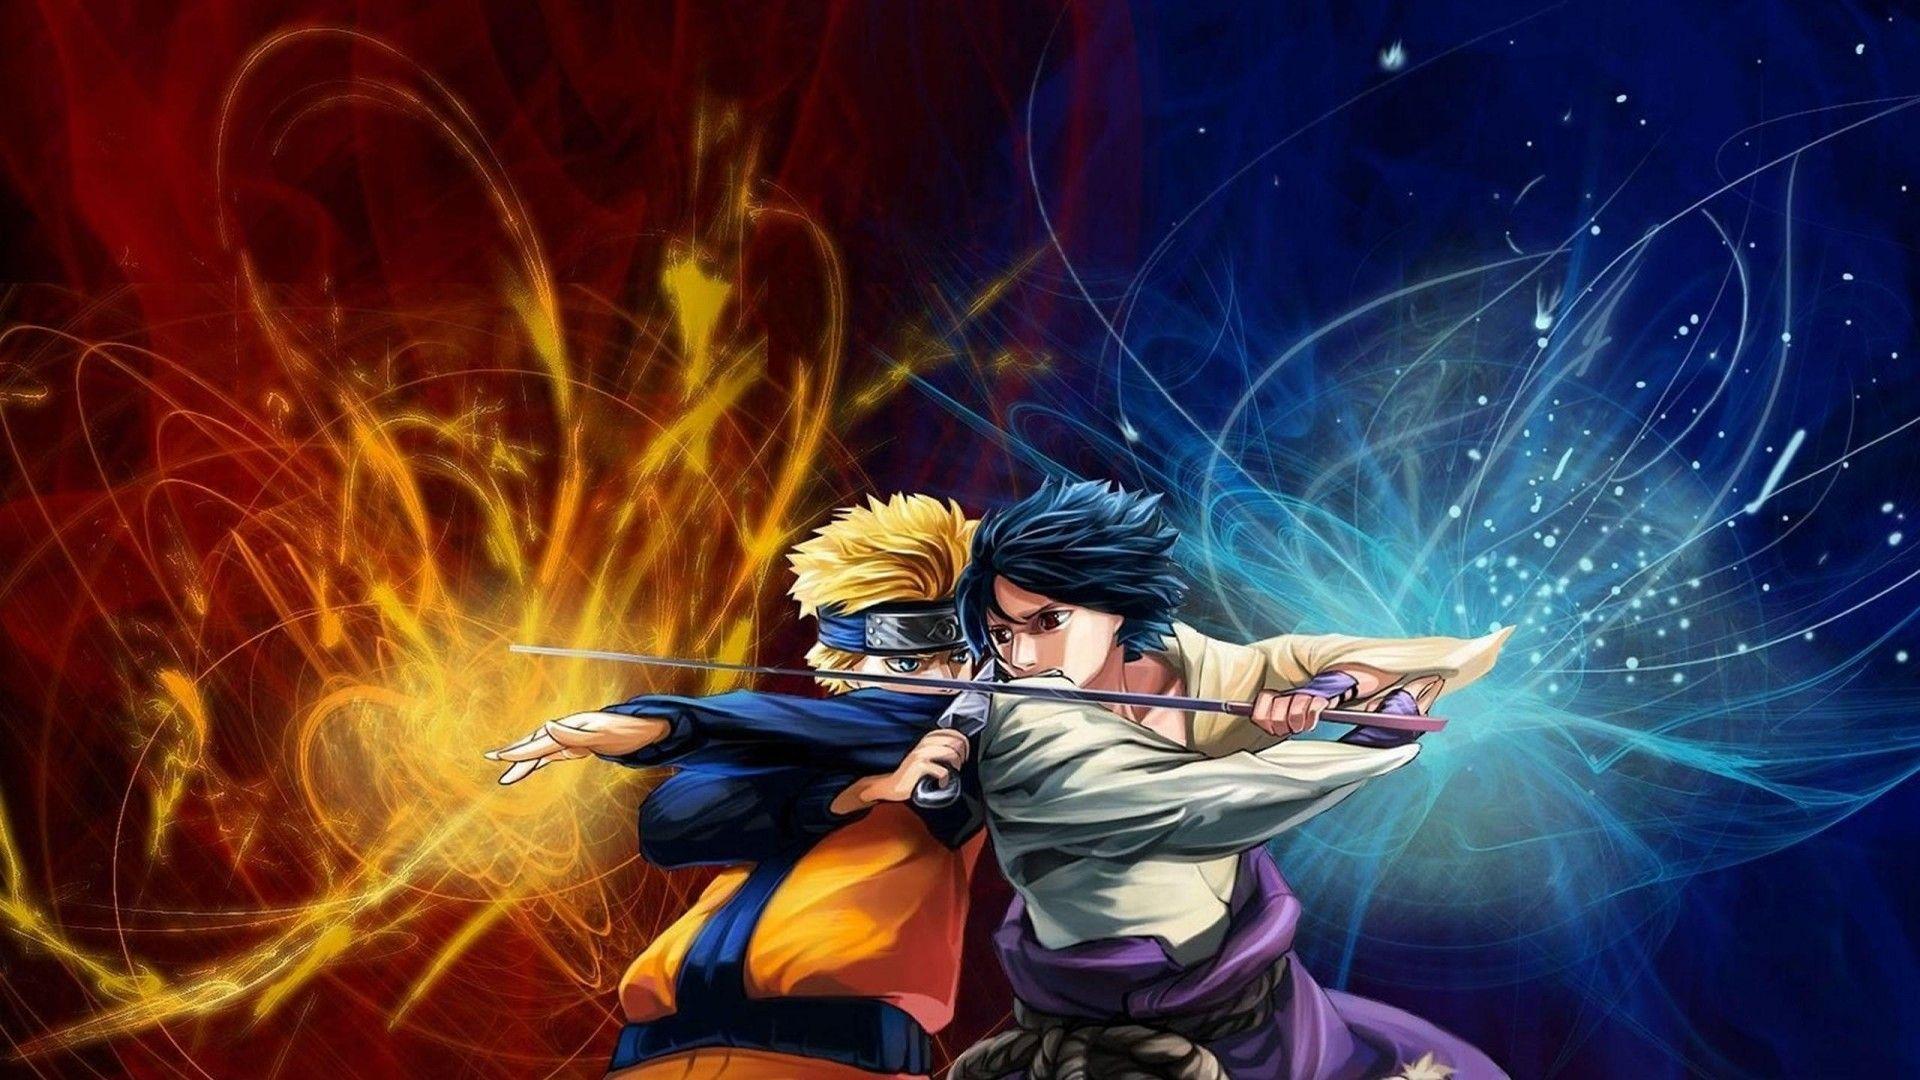 Naruto 1980x1080 Wallpapers Top Free Naruto 1980x1080 Backgrounds Wallpaperaccess